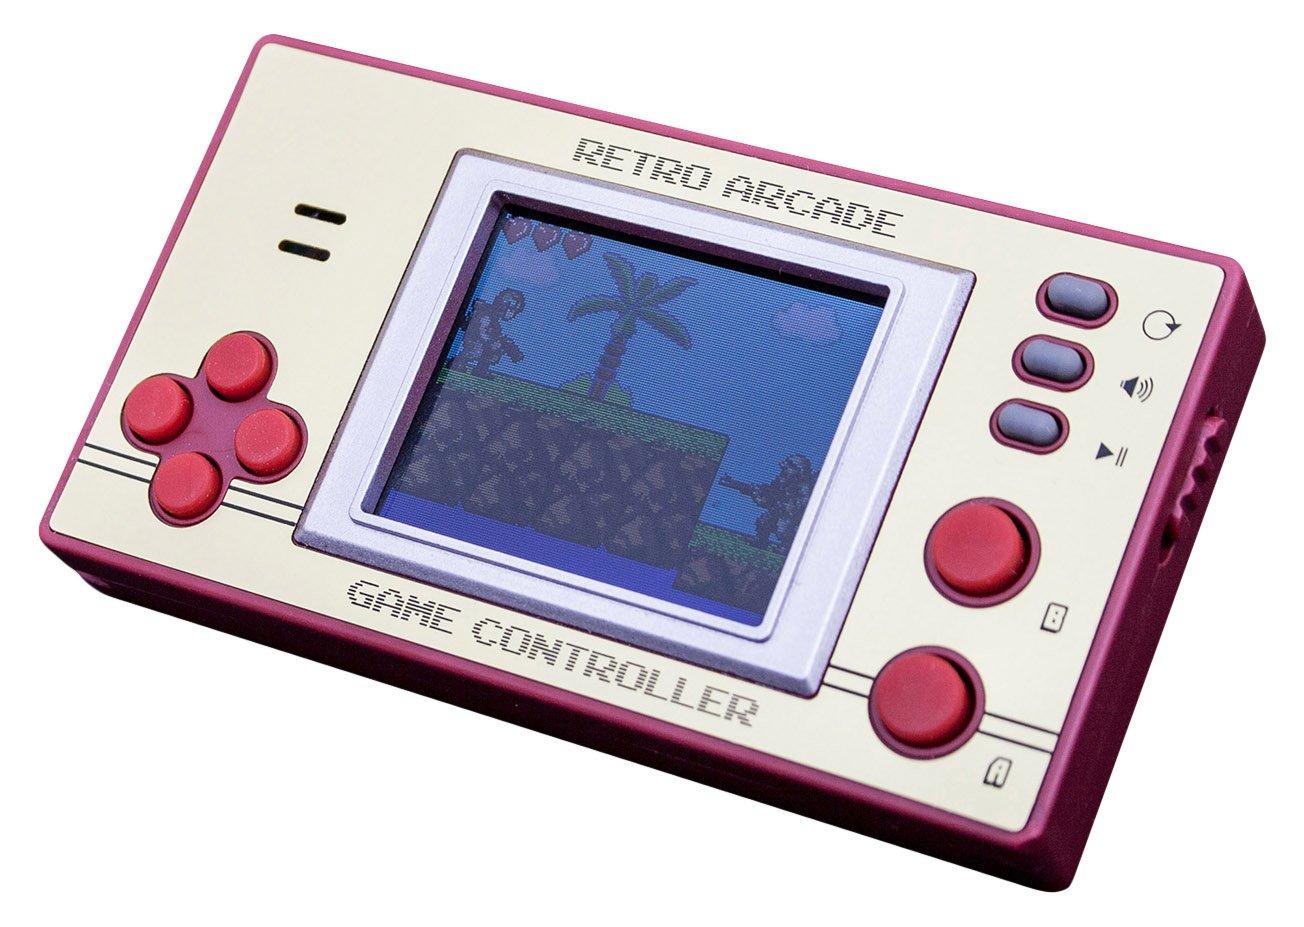 Thumbs Up A0001401 Retro Arcade Games inkl. 116 8-Bit Spielen OR-RETARCCTL